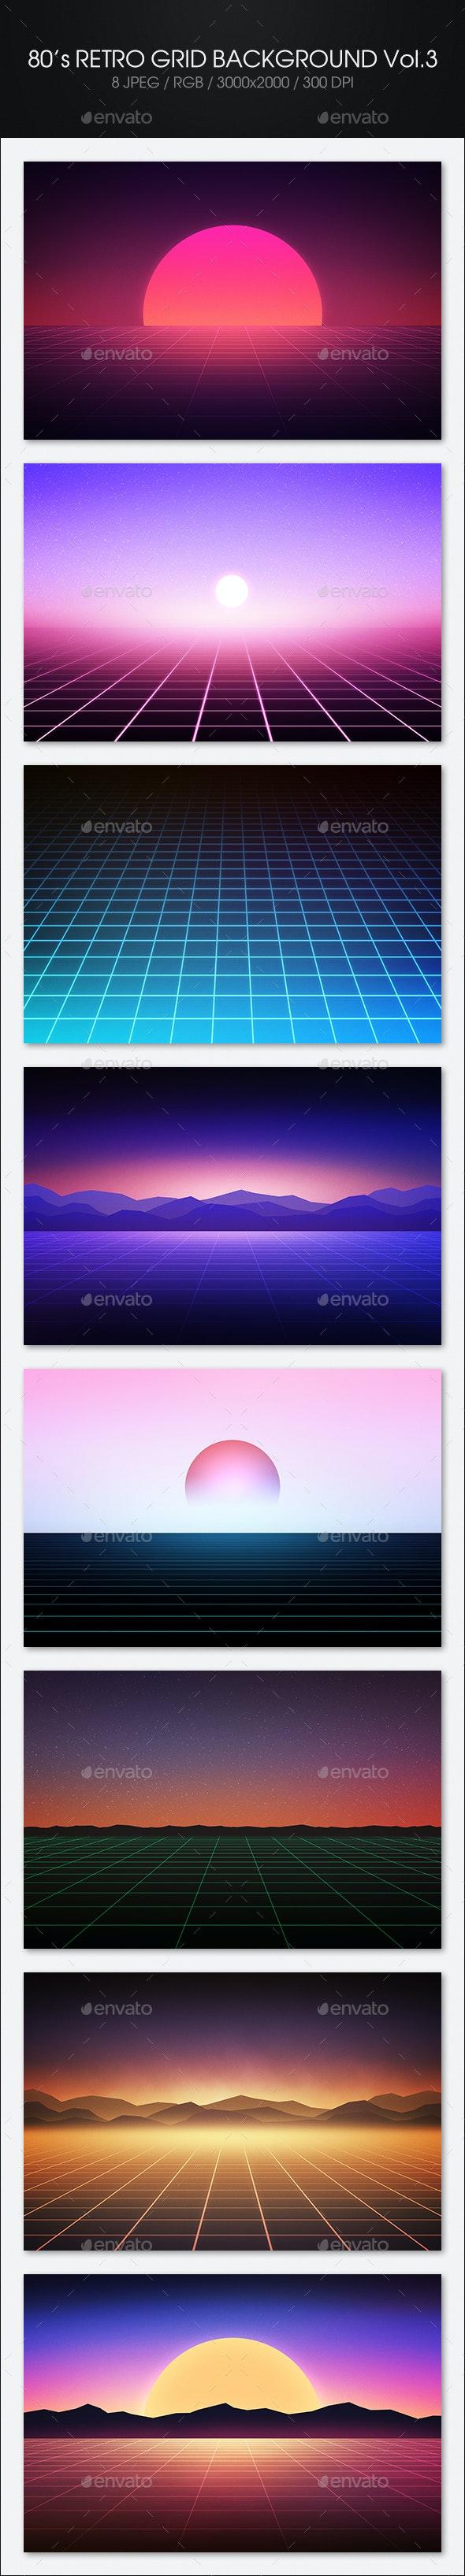 80's Retro Grid Background Vol.3 - Tech / Futuristic Backgrounds